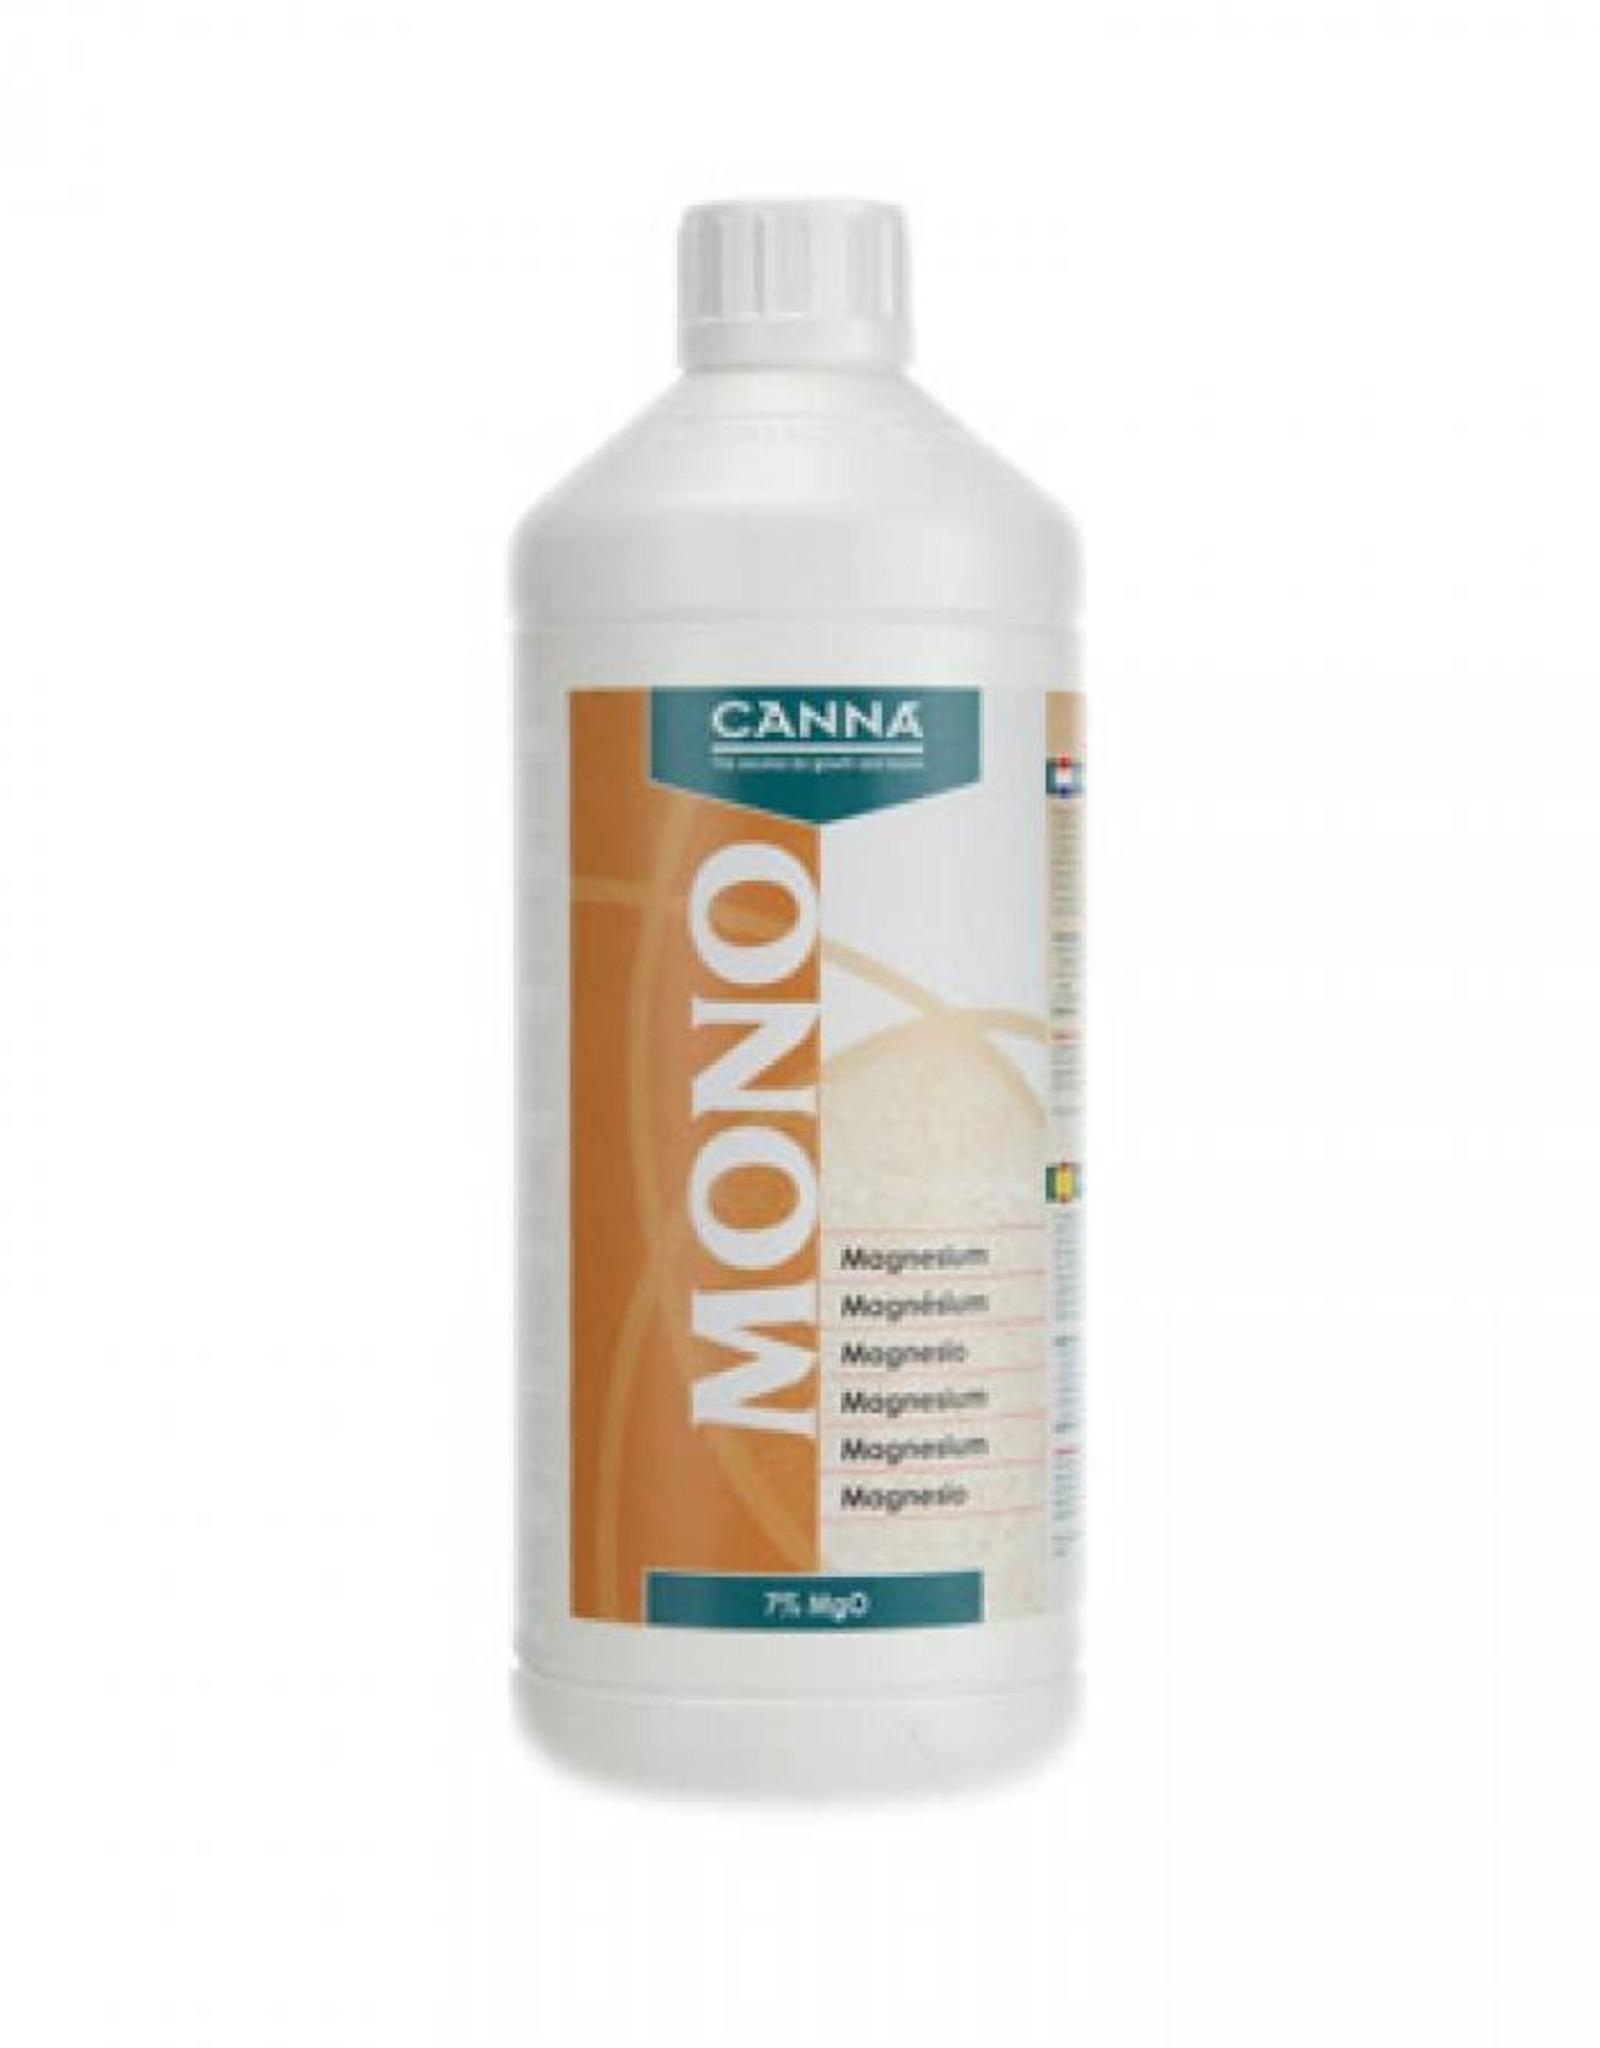 Canna Canna Mg0 7% 1l